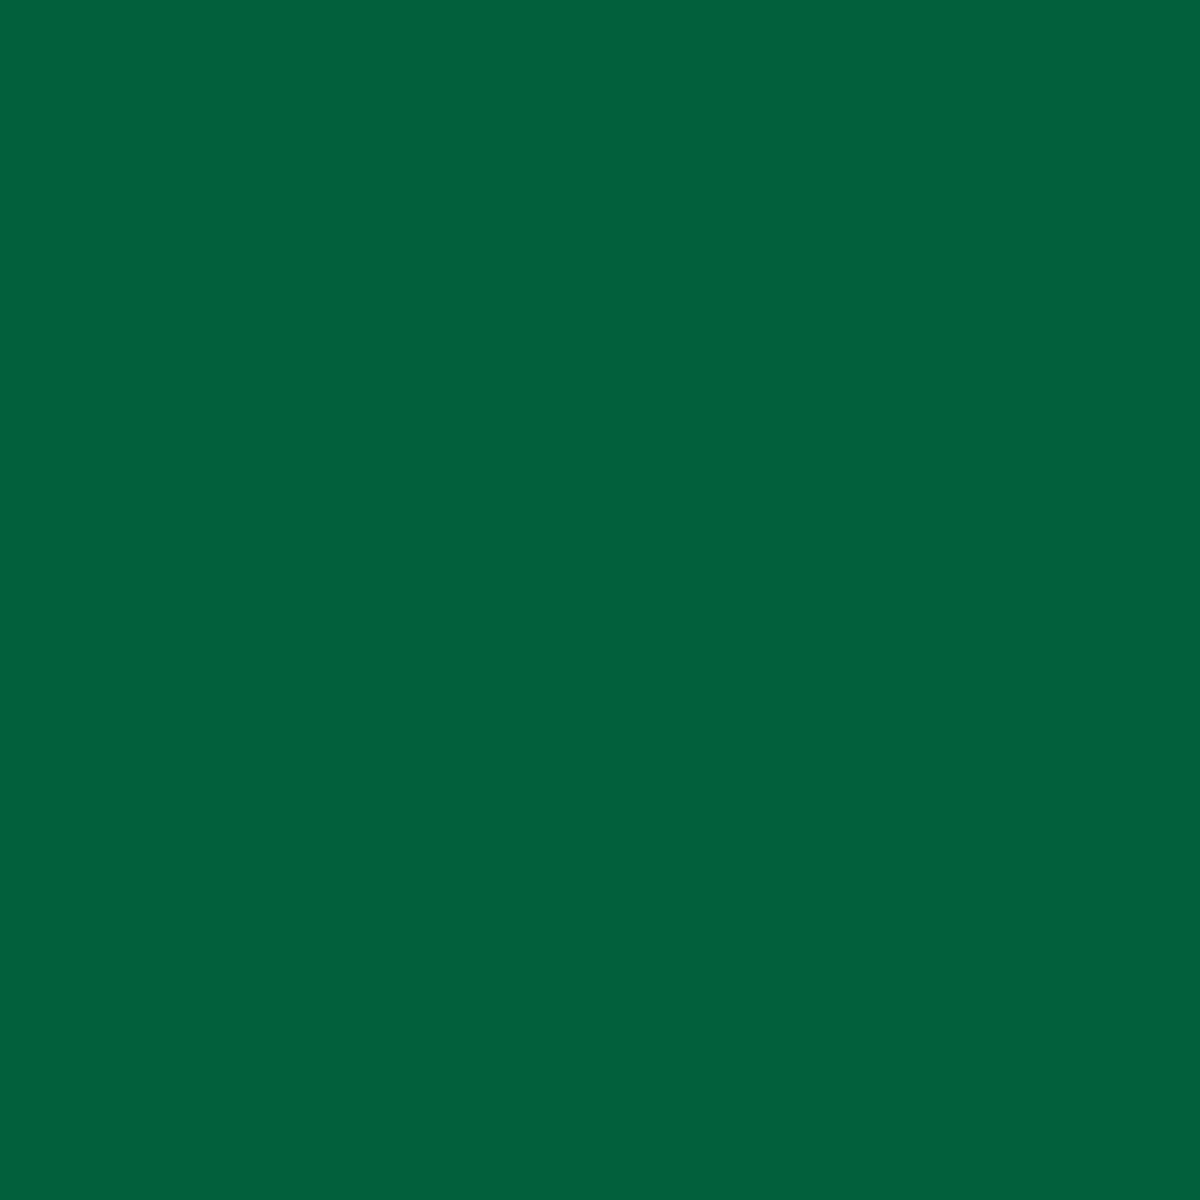 Vopsea lavabilă Chalkboard Deep Green, Benjamin Moore, 1 litru / cutie